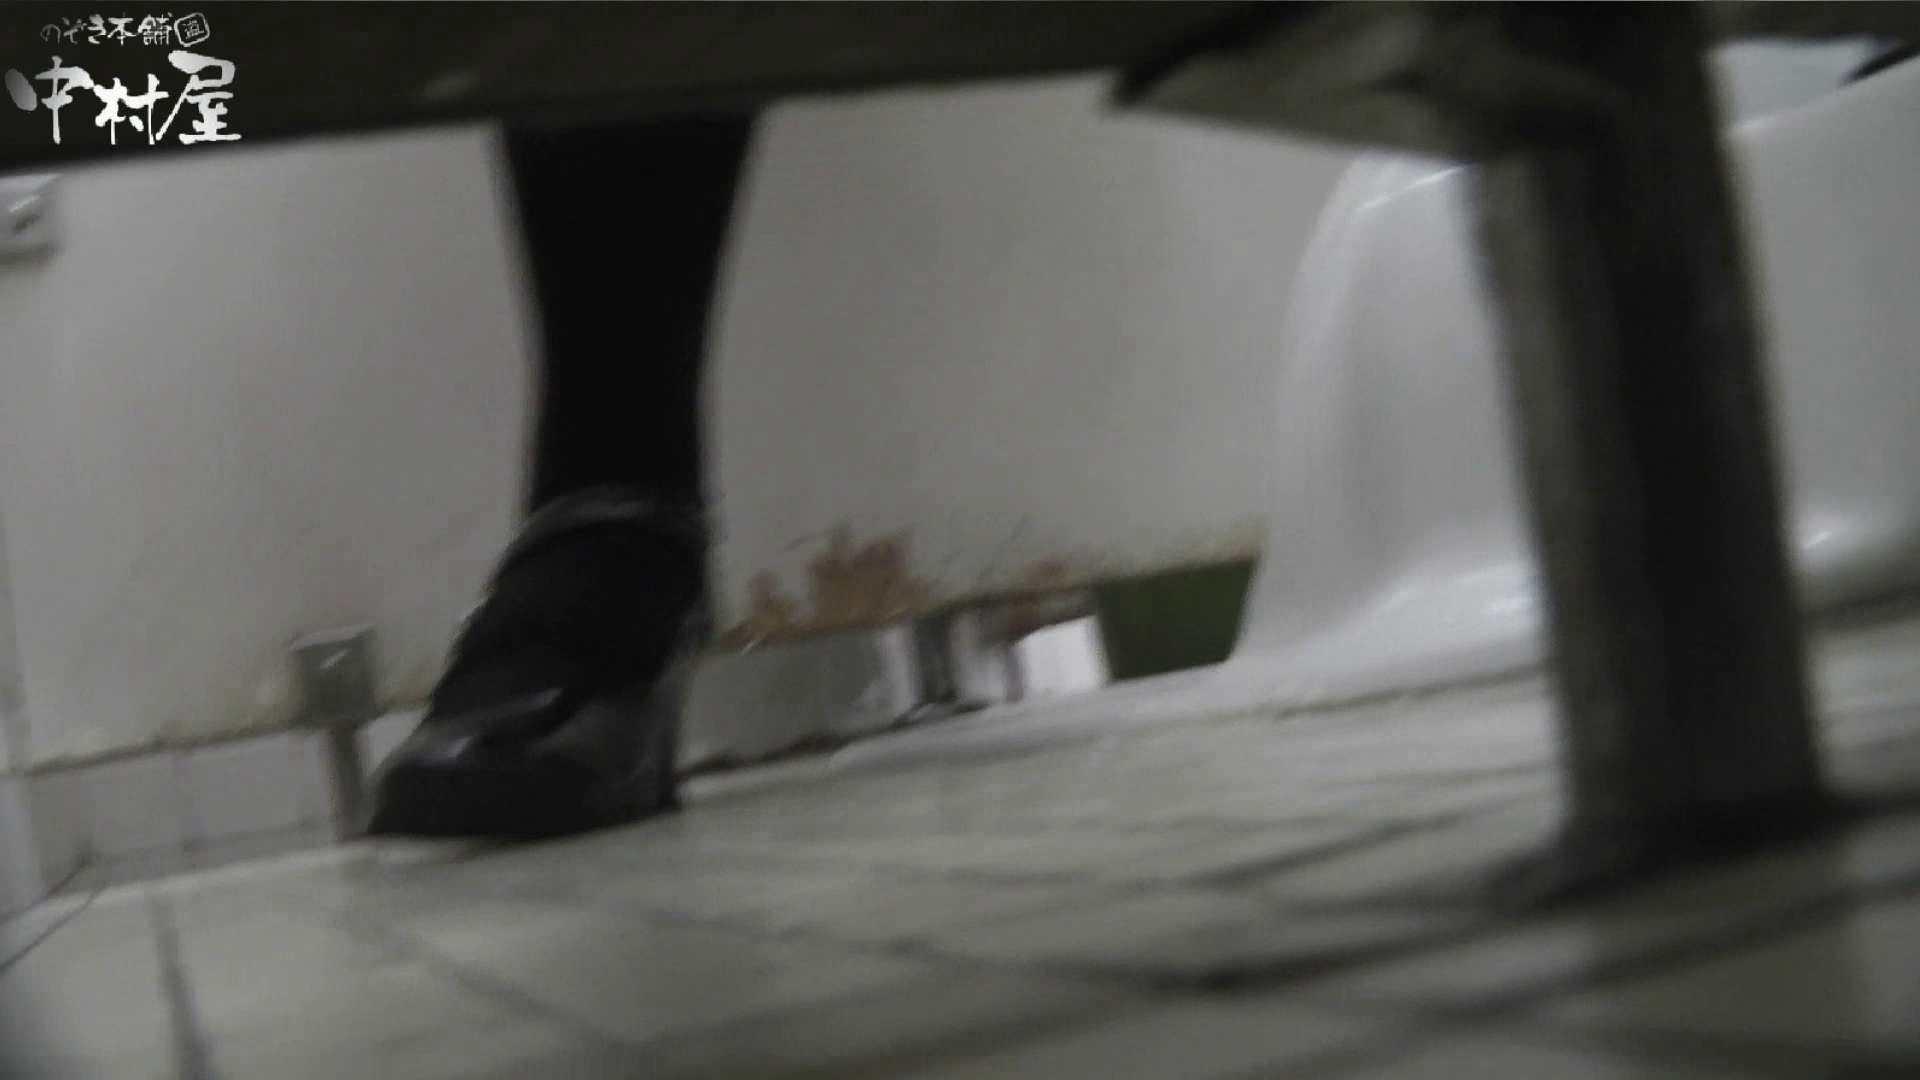 vol.25 命がけ潜伏洗面所! 咥えタオルは剛毛の証!? プライベート セックス画像 105連発 11